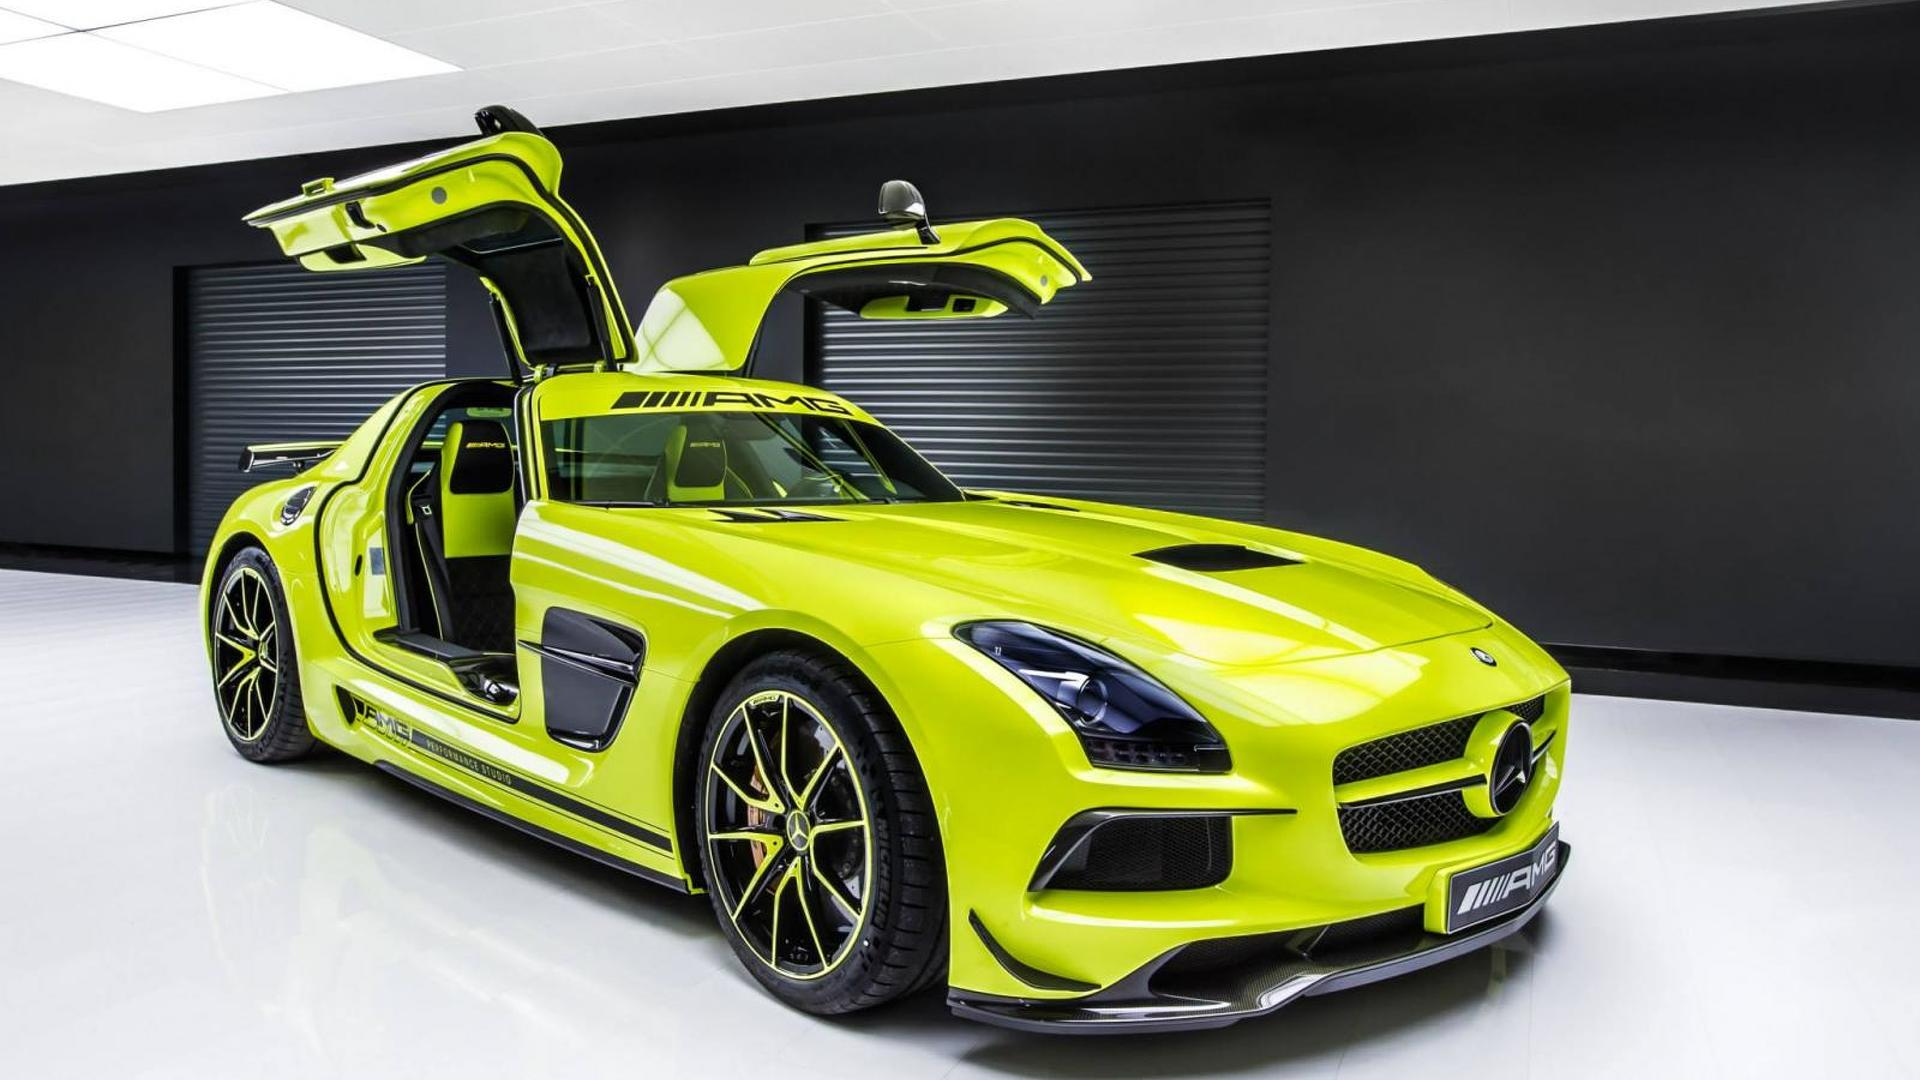 Sls Black Series >> Mercedes Sls Amg Black Series Gets The Bespoke Treatment By